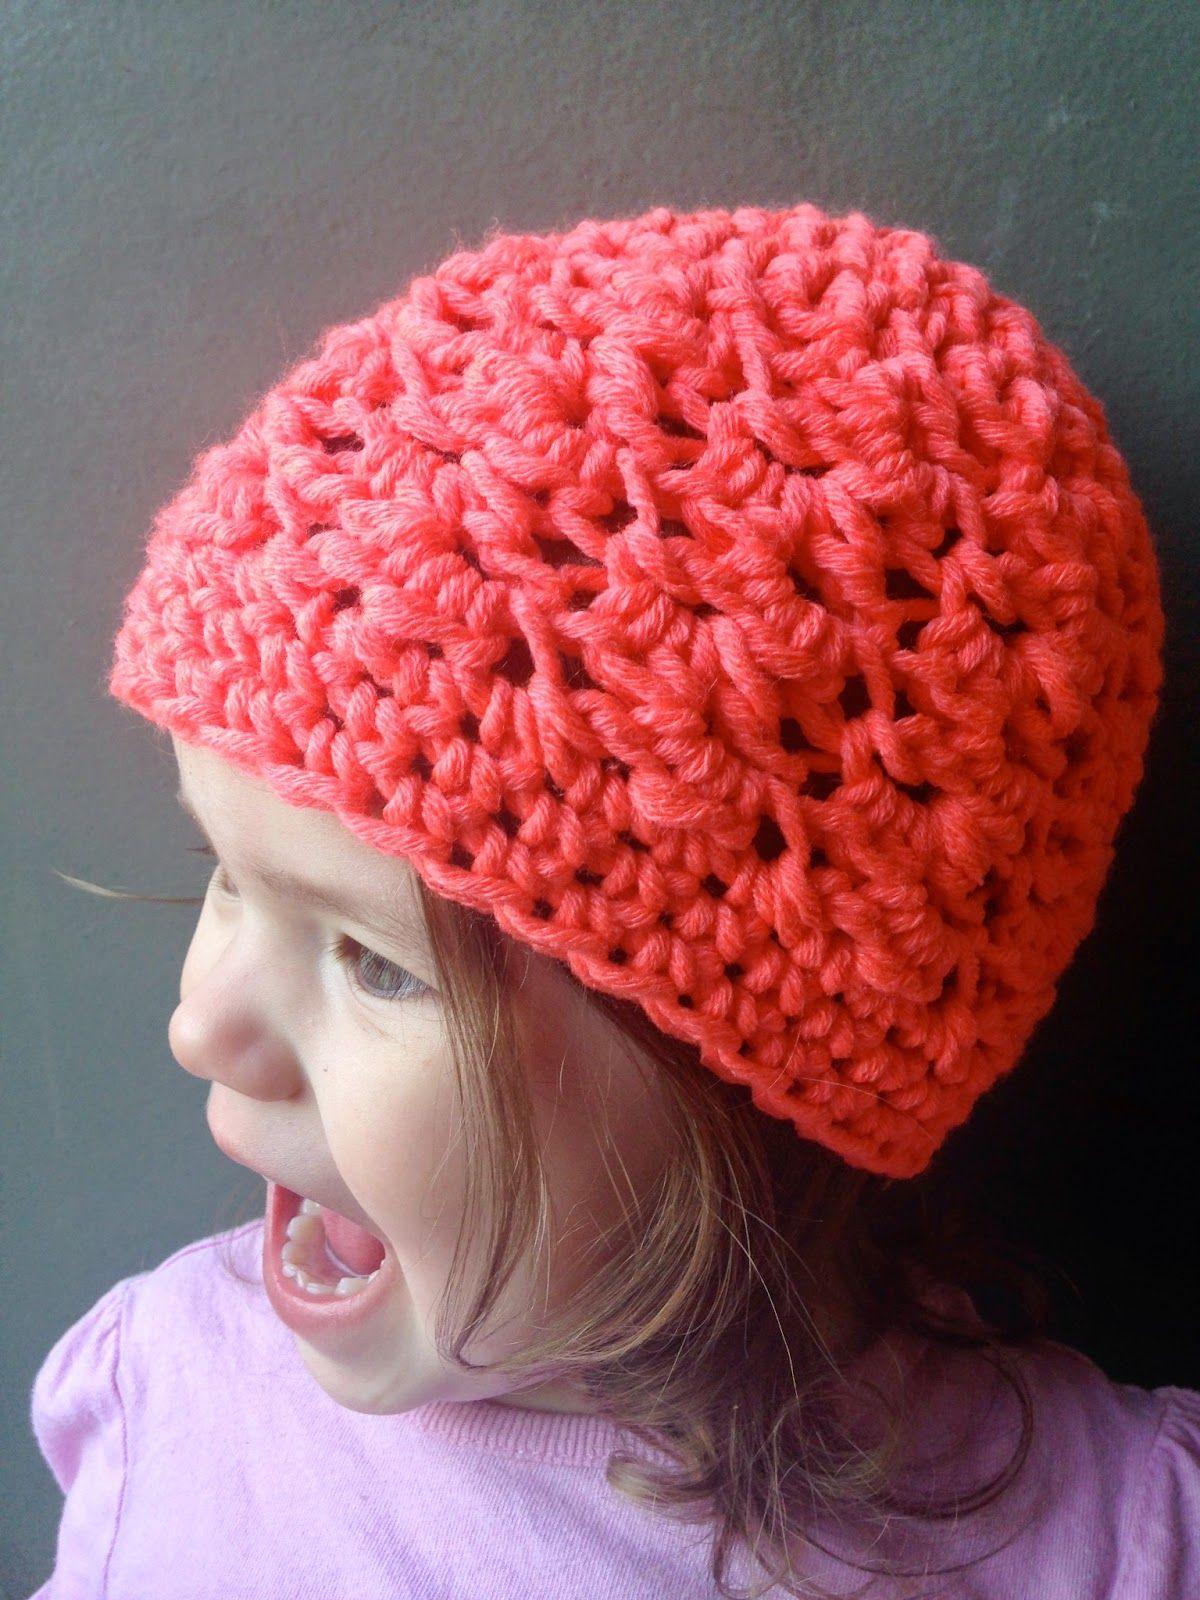 Textured Toddler Beanie: Free Crochet Pattern | Pinterest